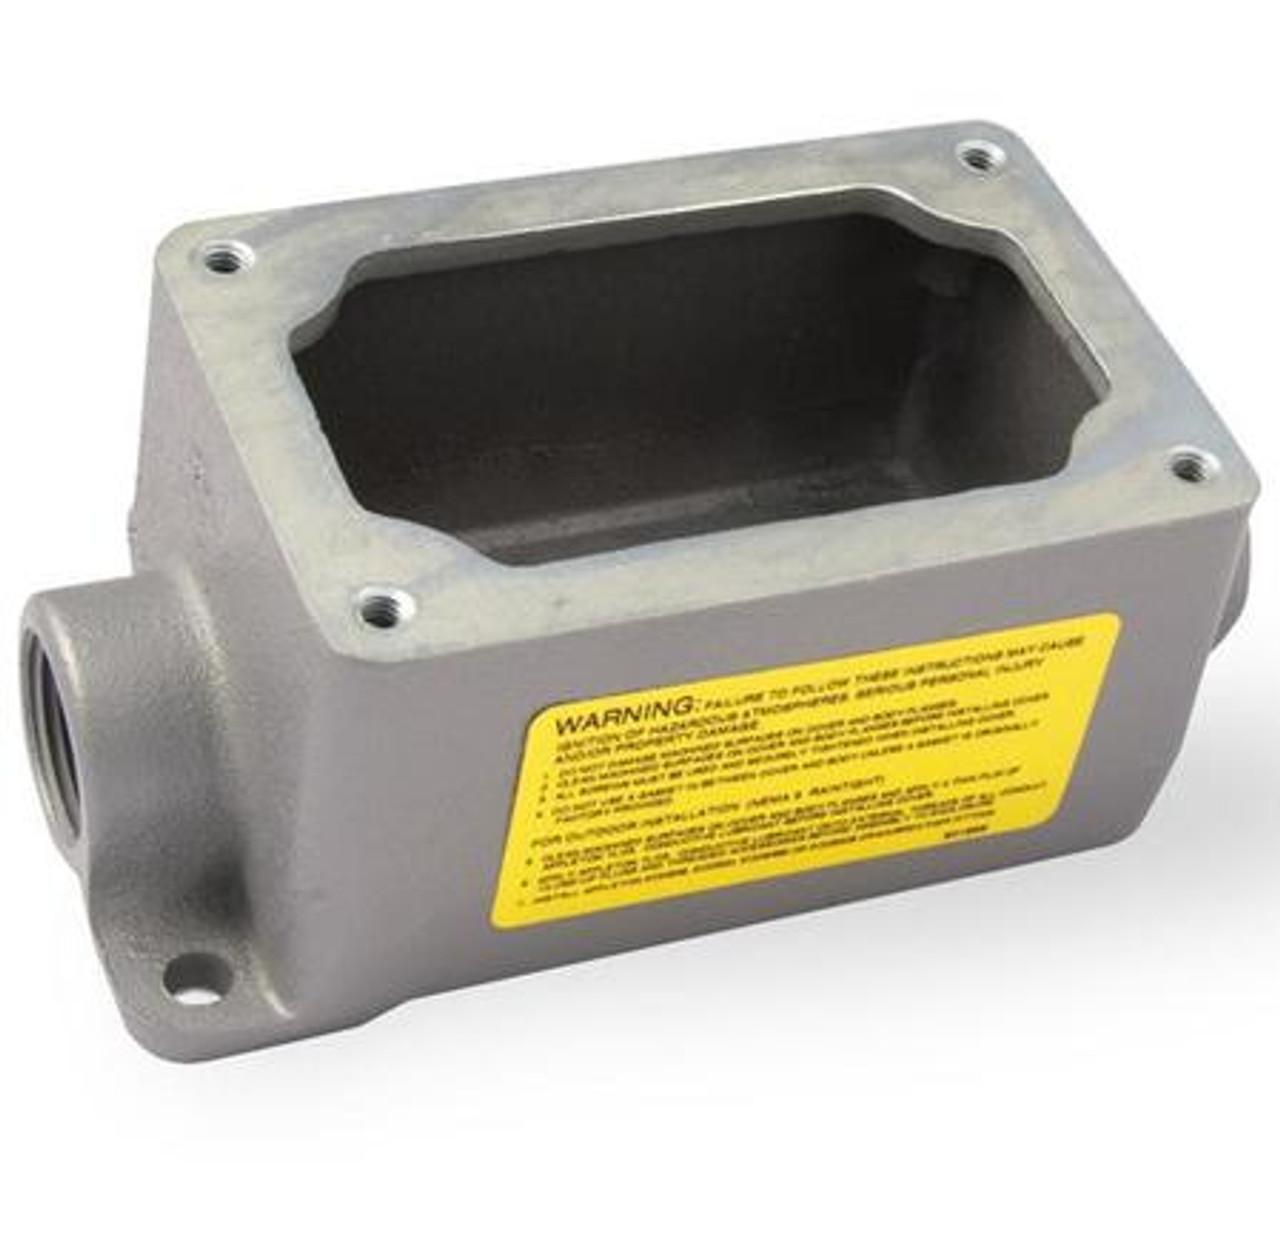 Appleton Explosion Proof Enclosure Switch Starter Efdc175-Nl-Q New Efk-F12-0